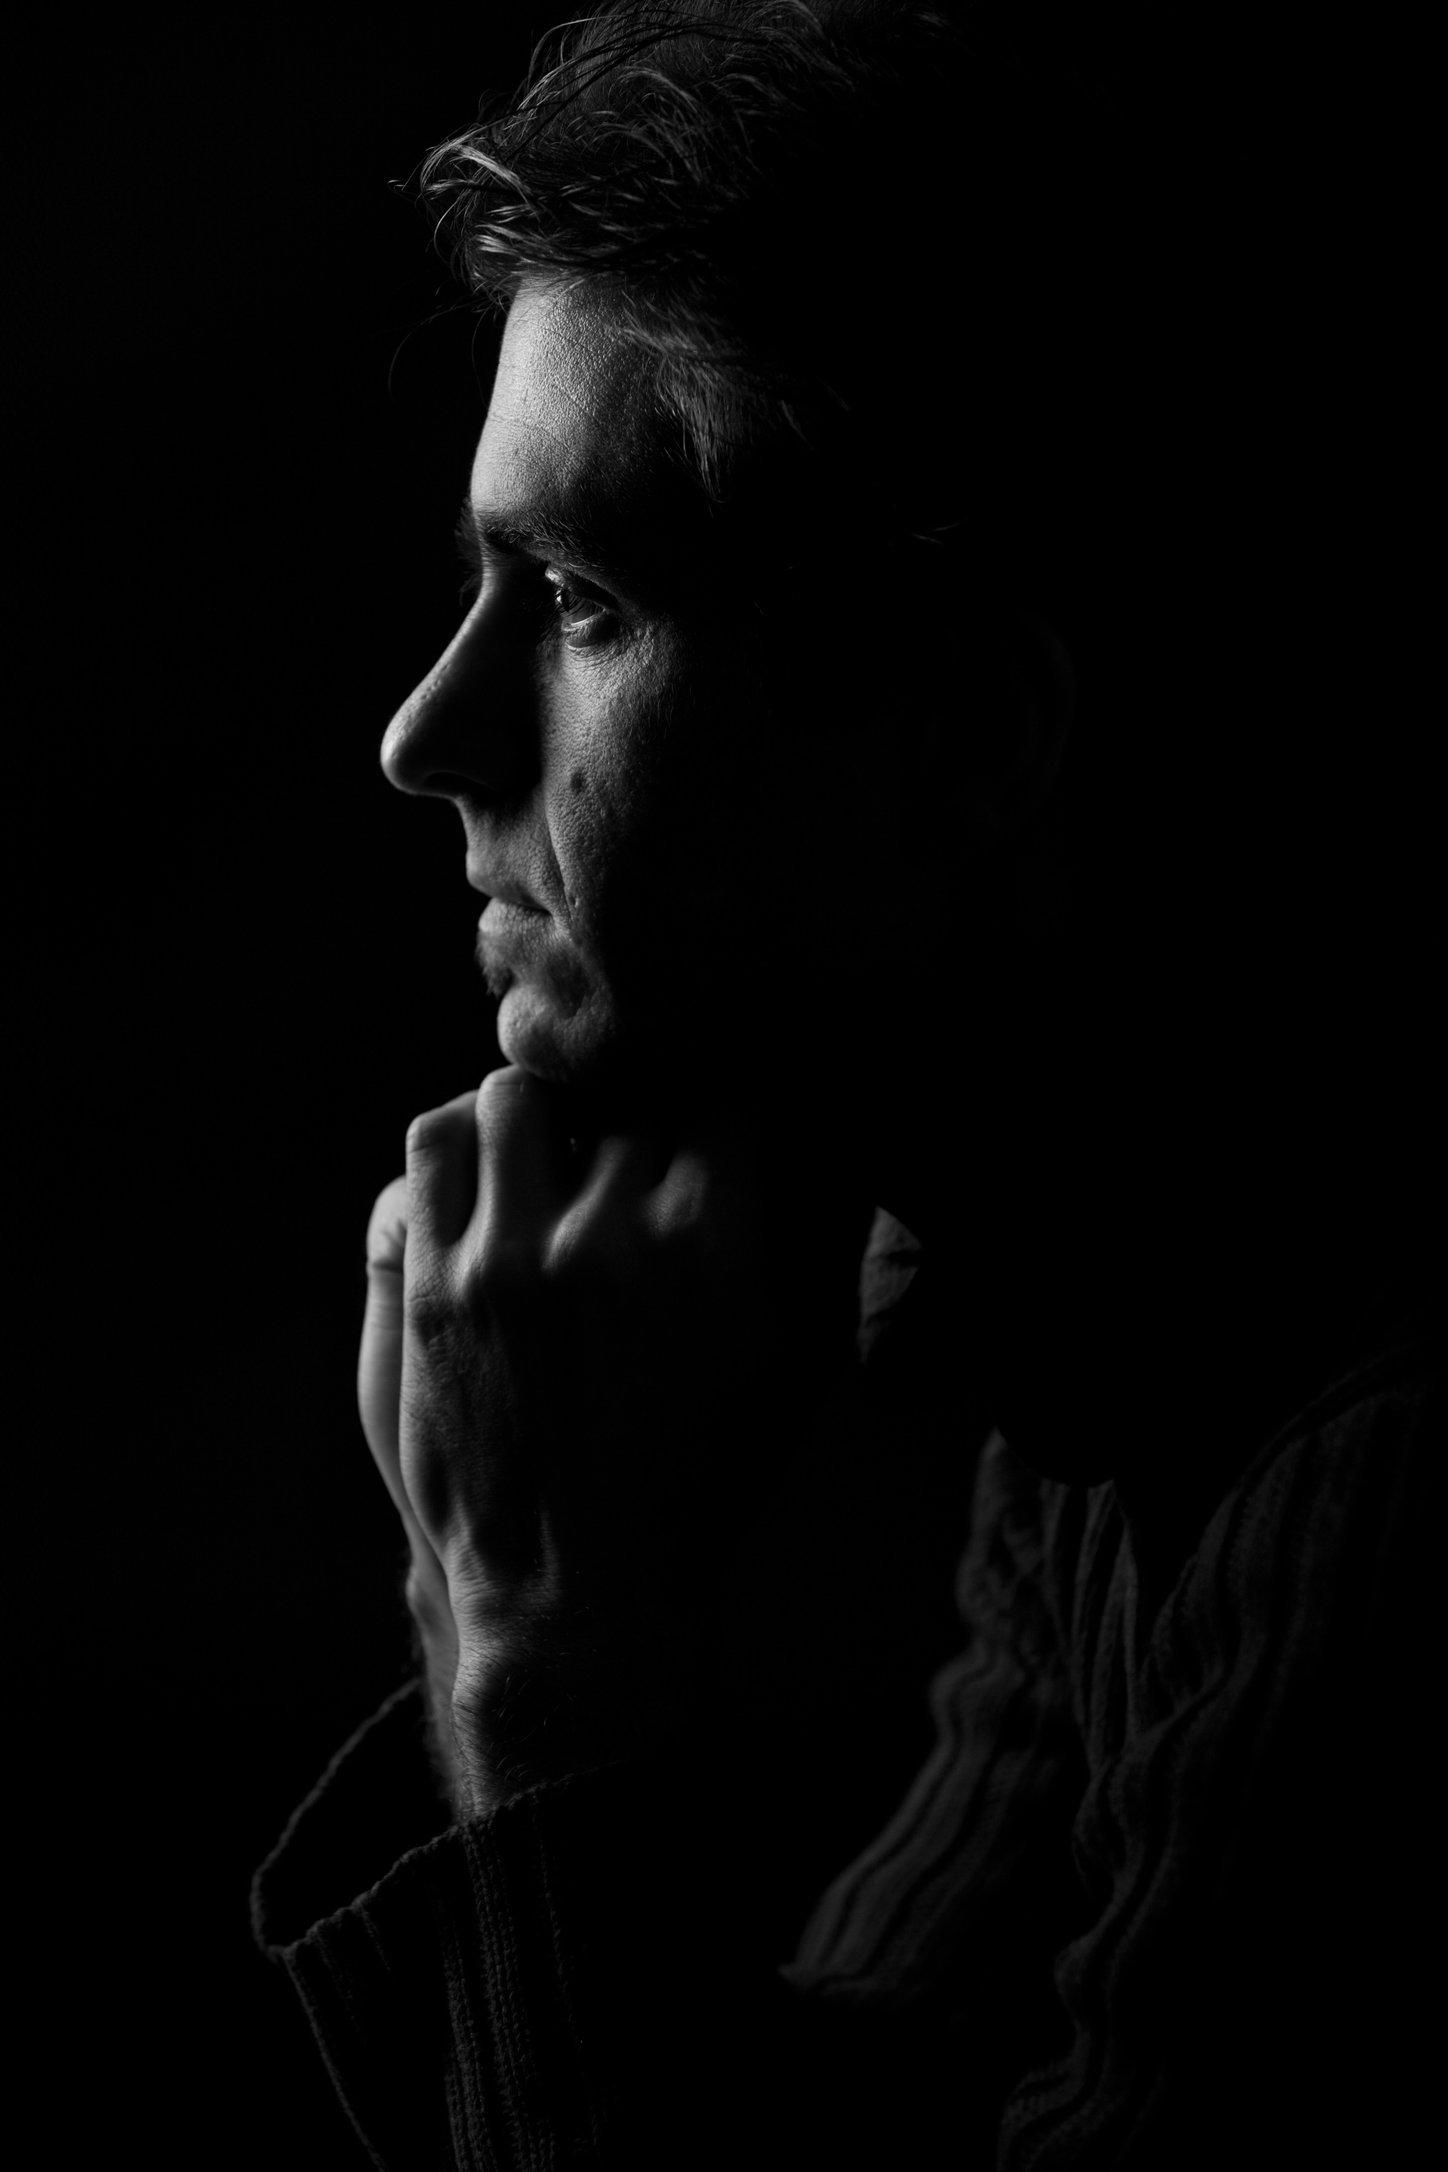 portretfoto man en profile